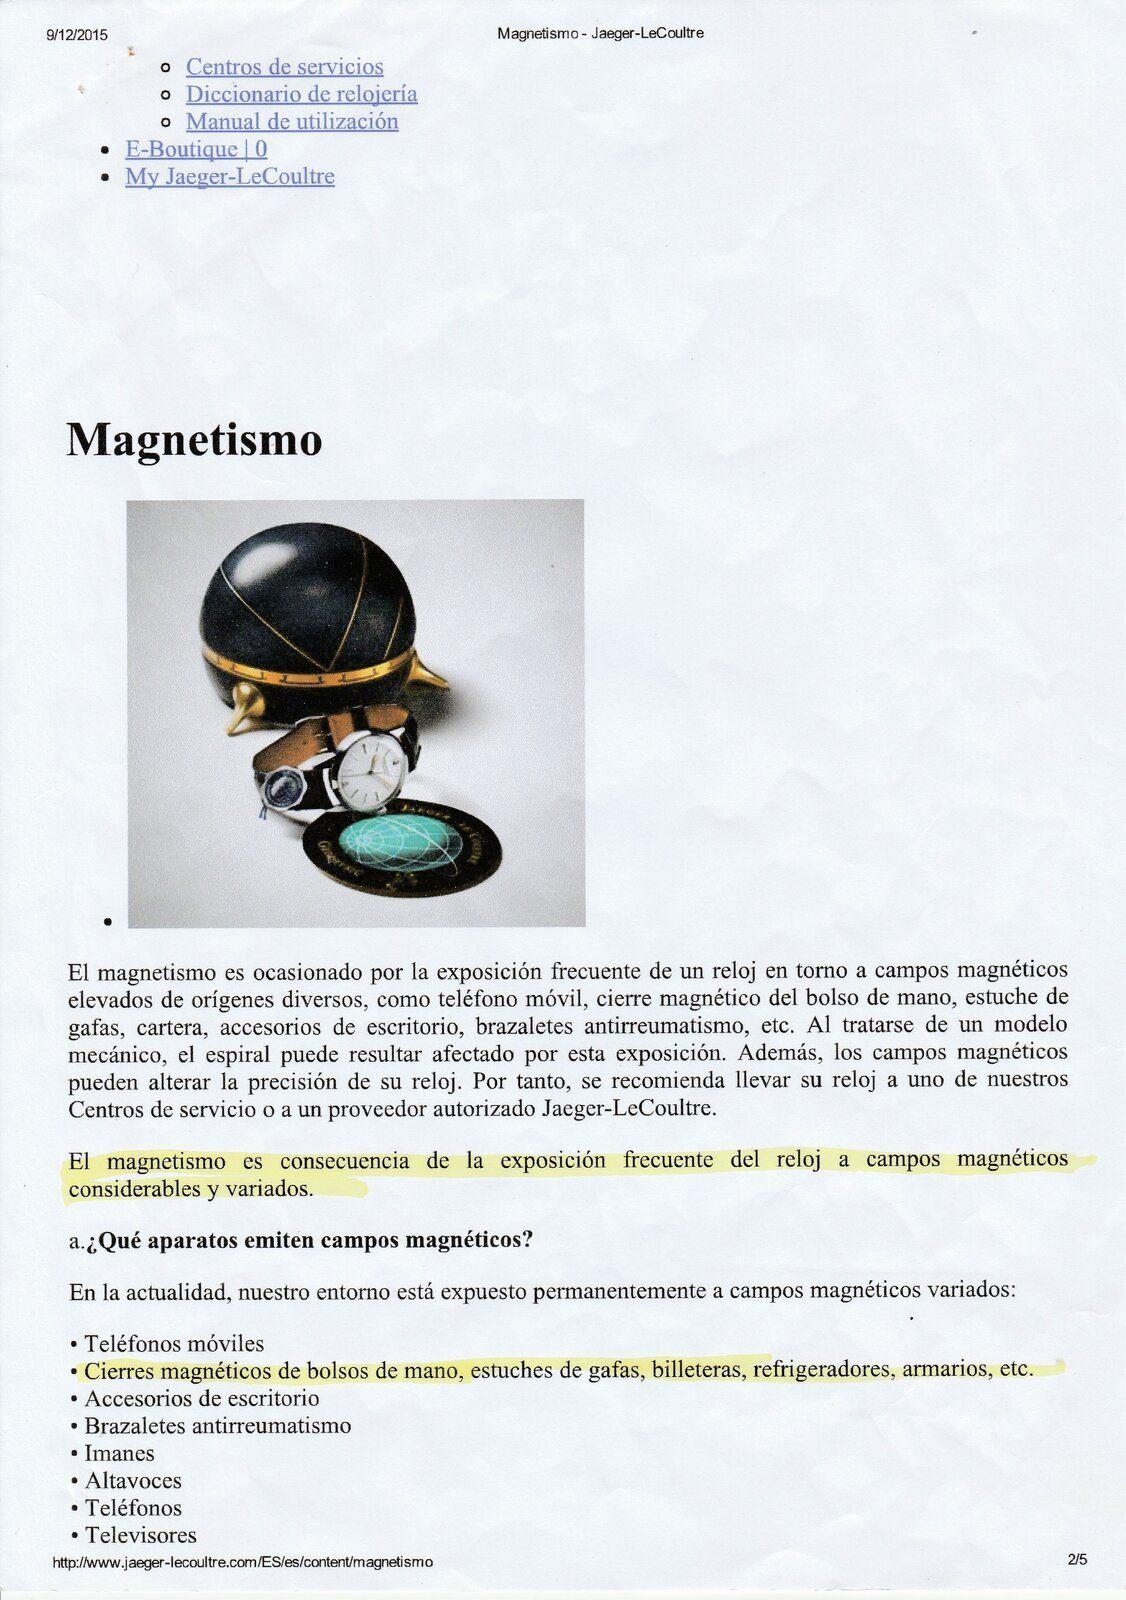 IMG_20210624_0002.jpg